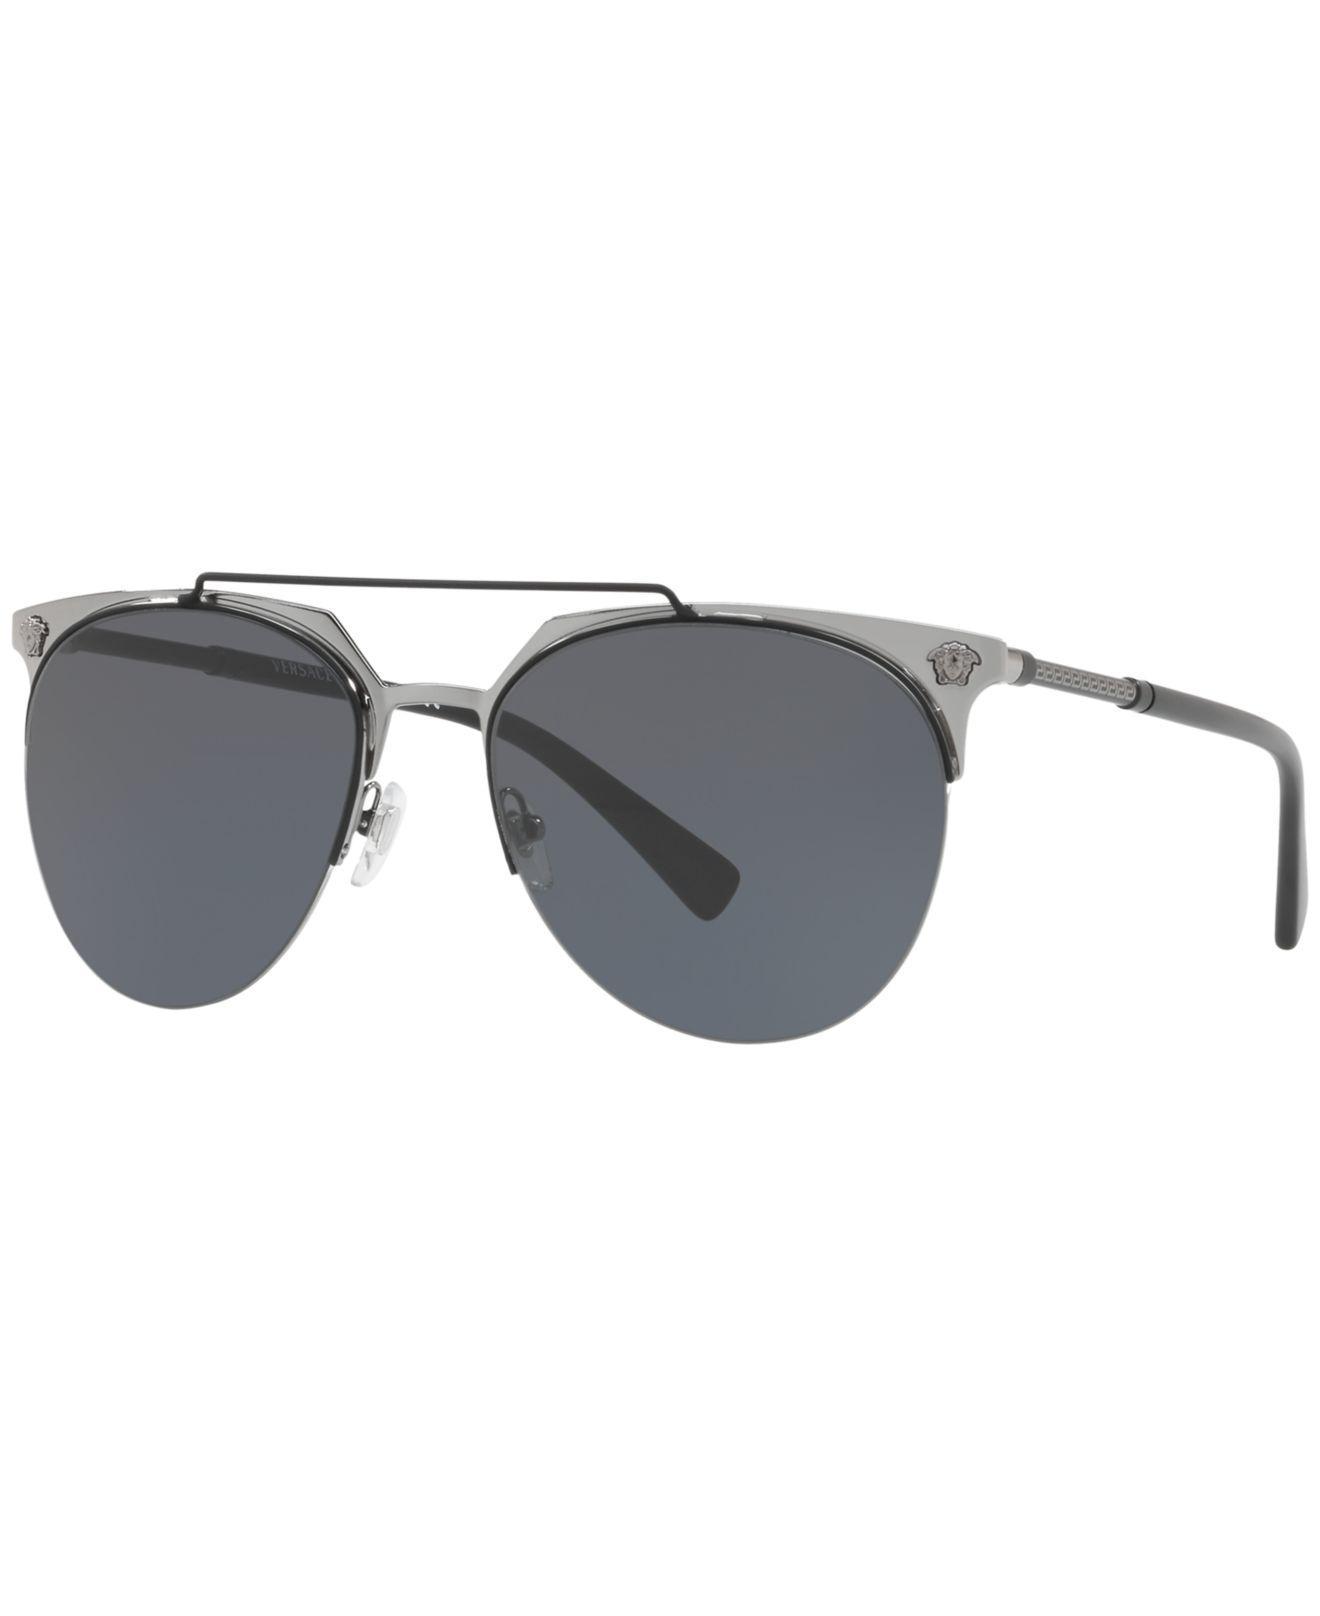 b68372732e Versace. Men s Gray Sunglasses ...